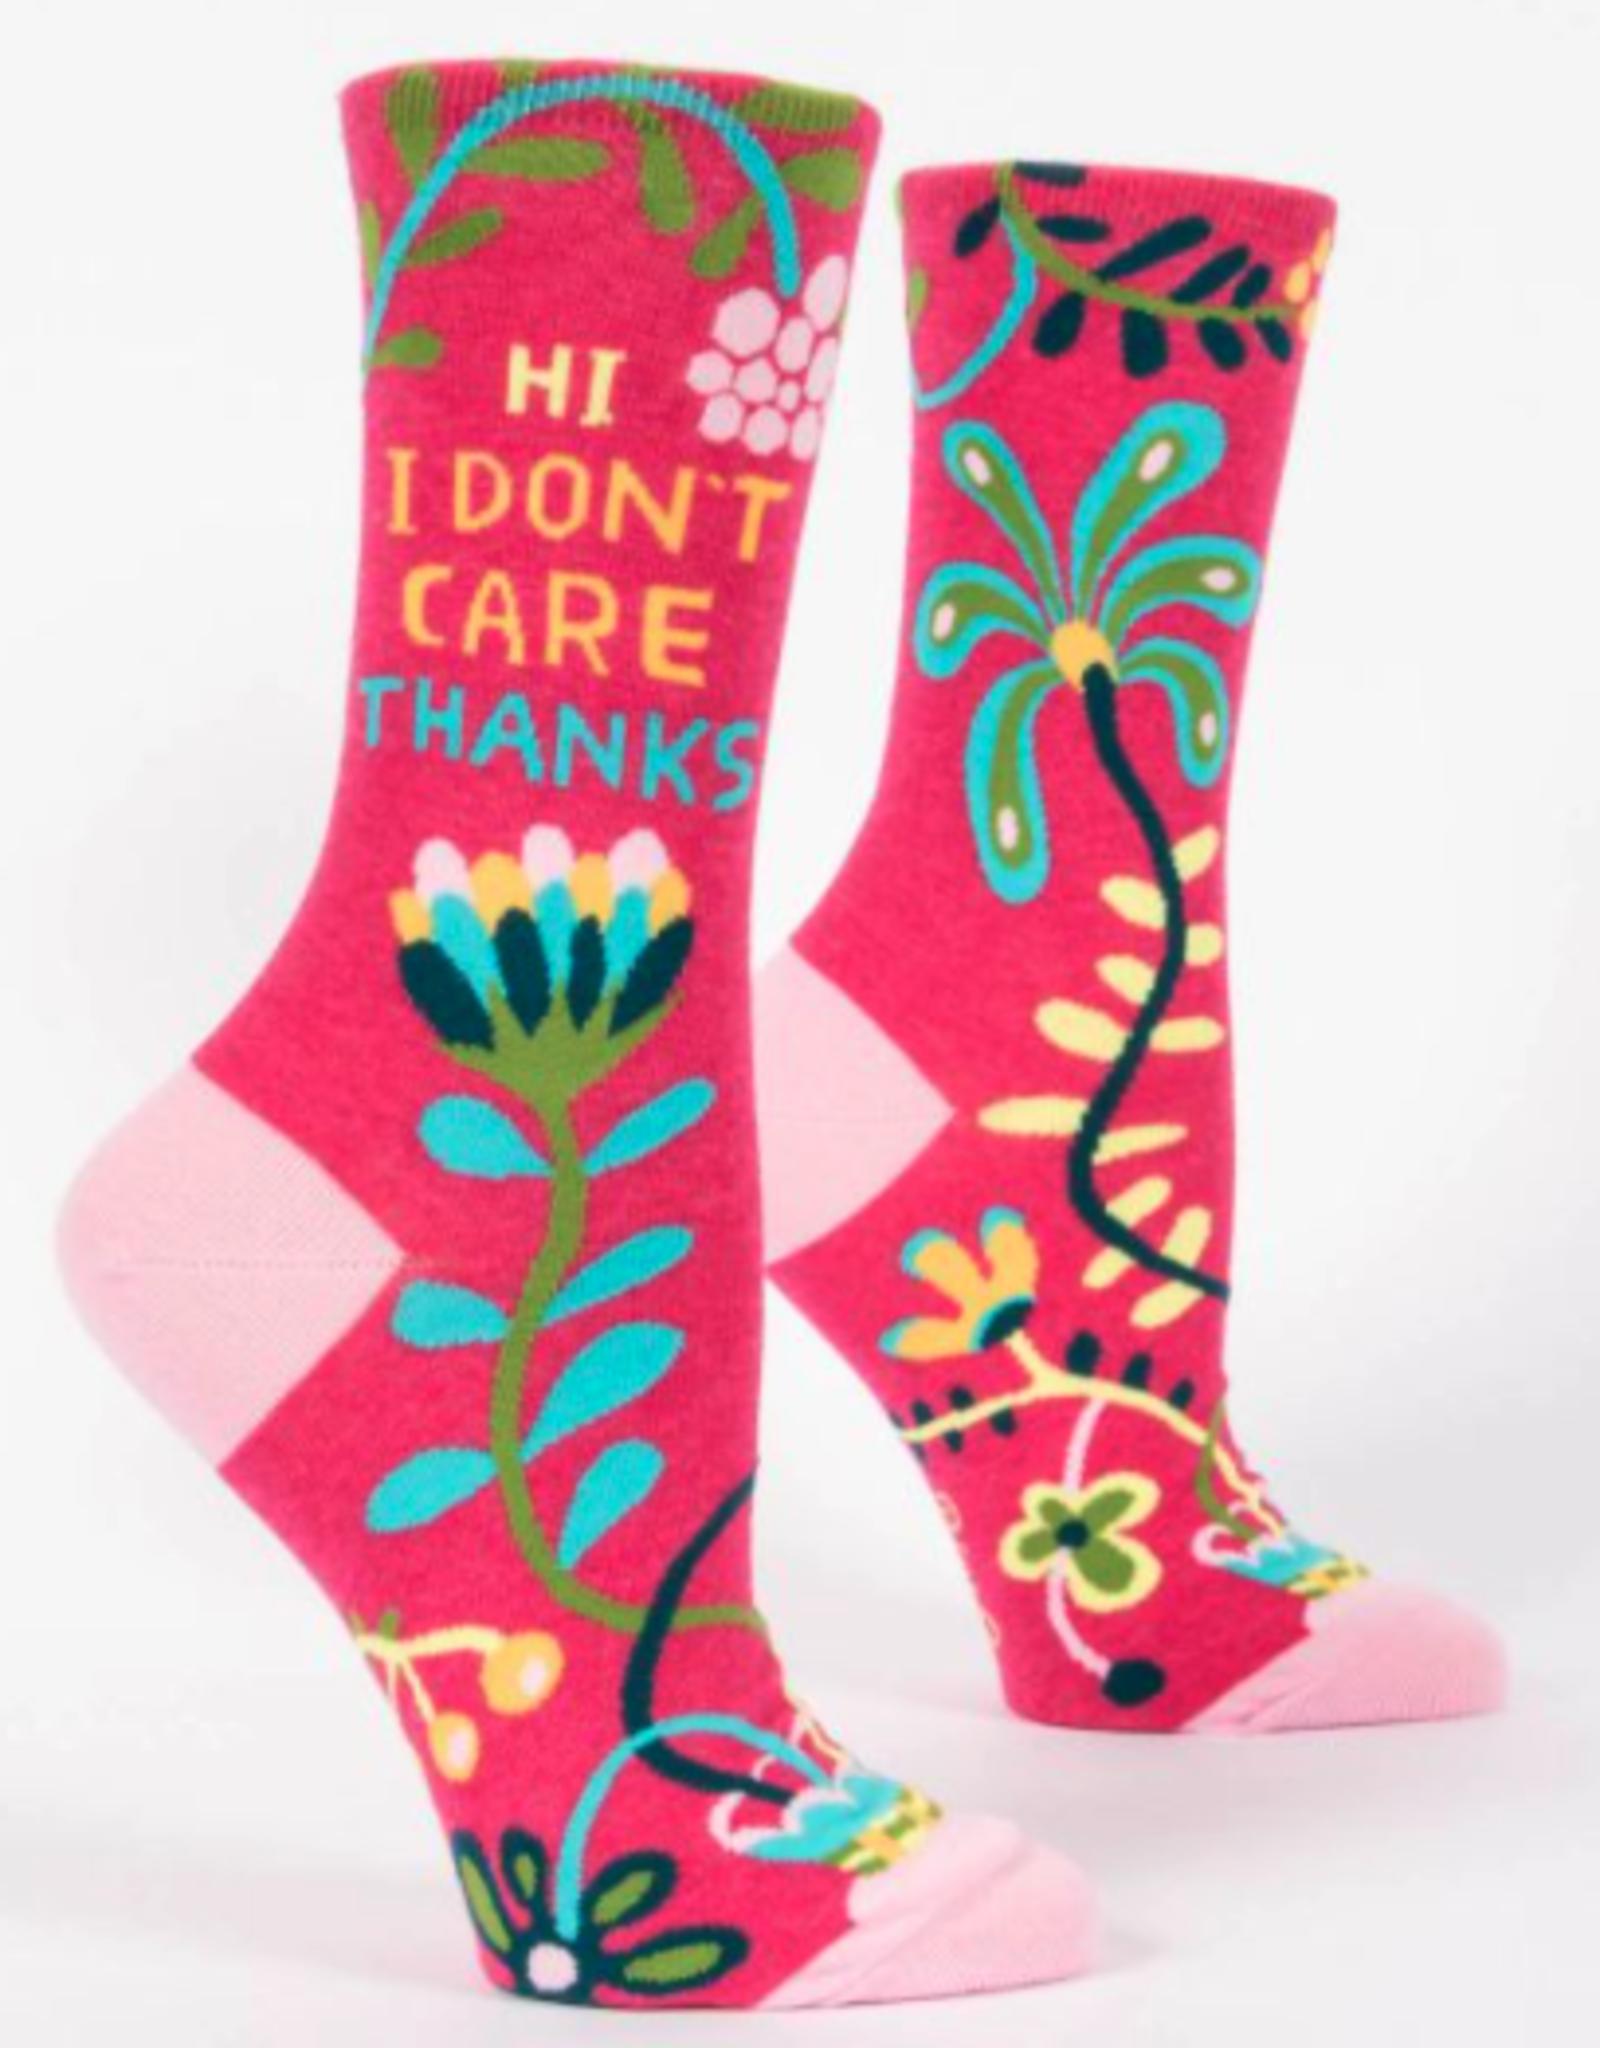 Blue Q Blue Q - Crew Socks - Hi I Don't Care